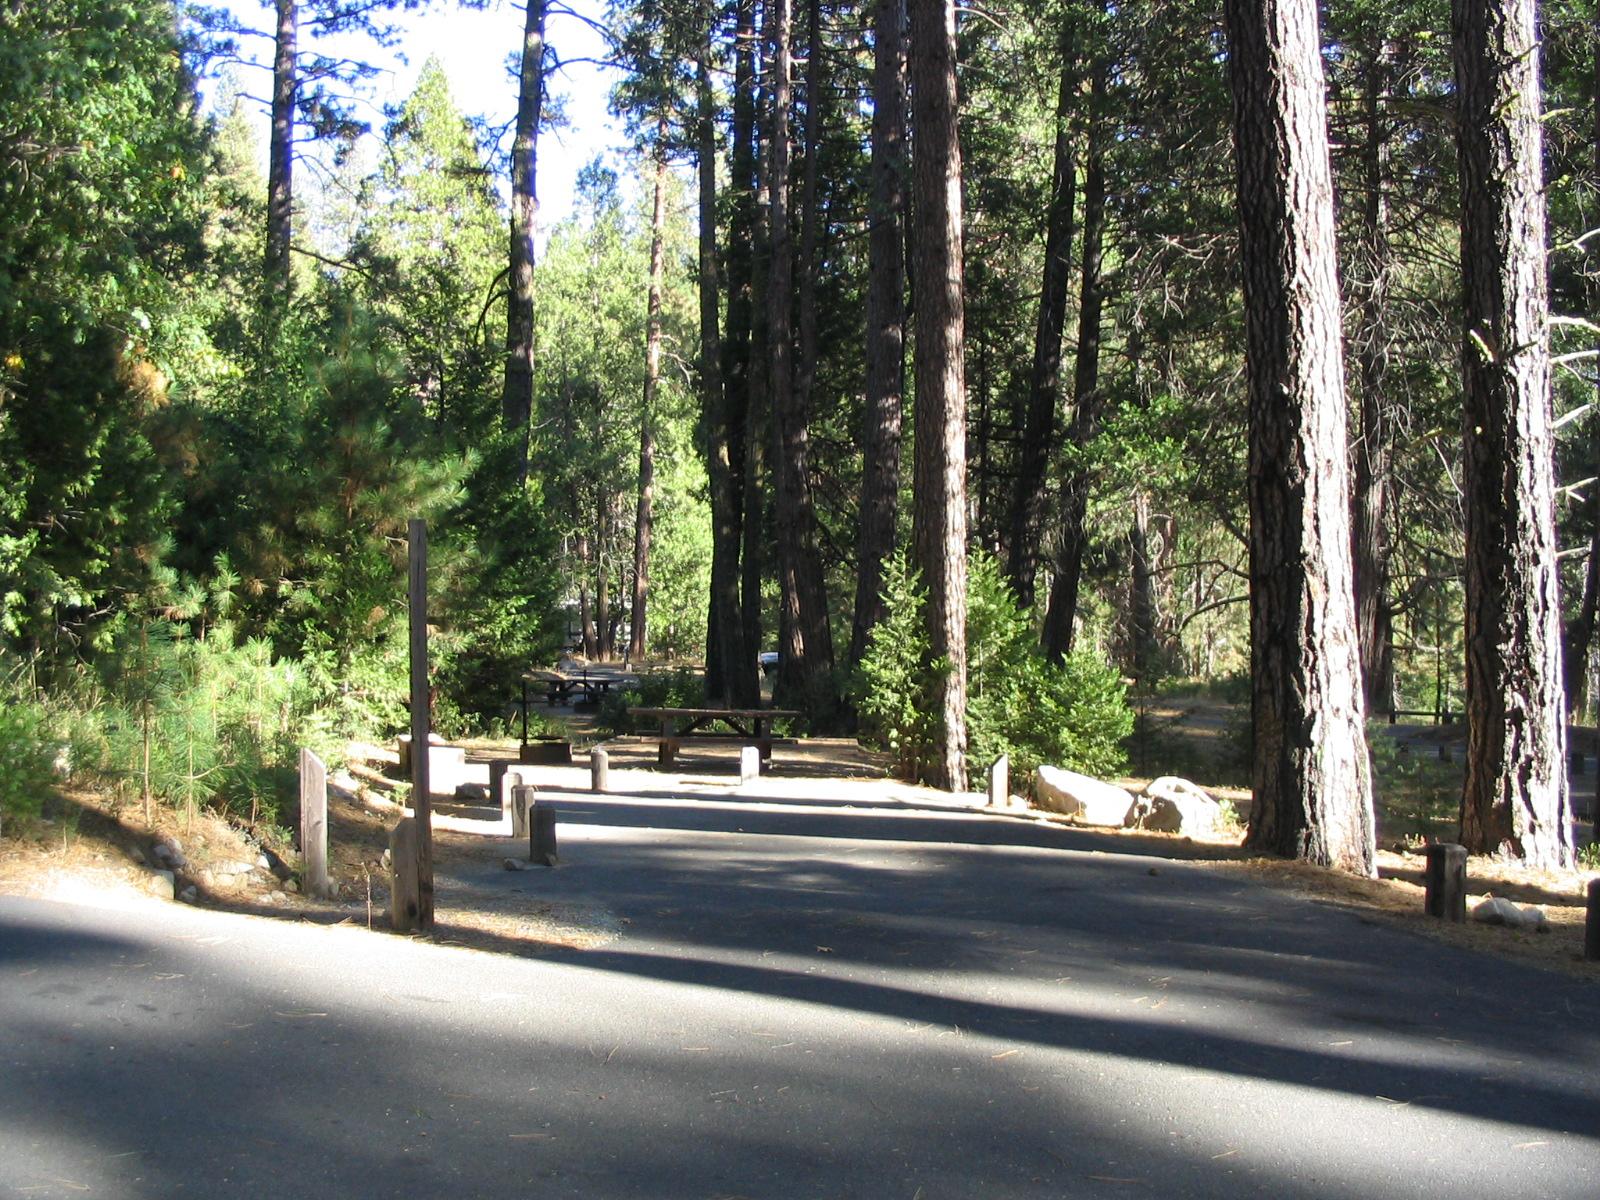 RV-friendly campsites